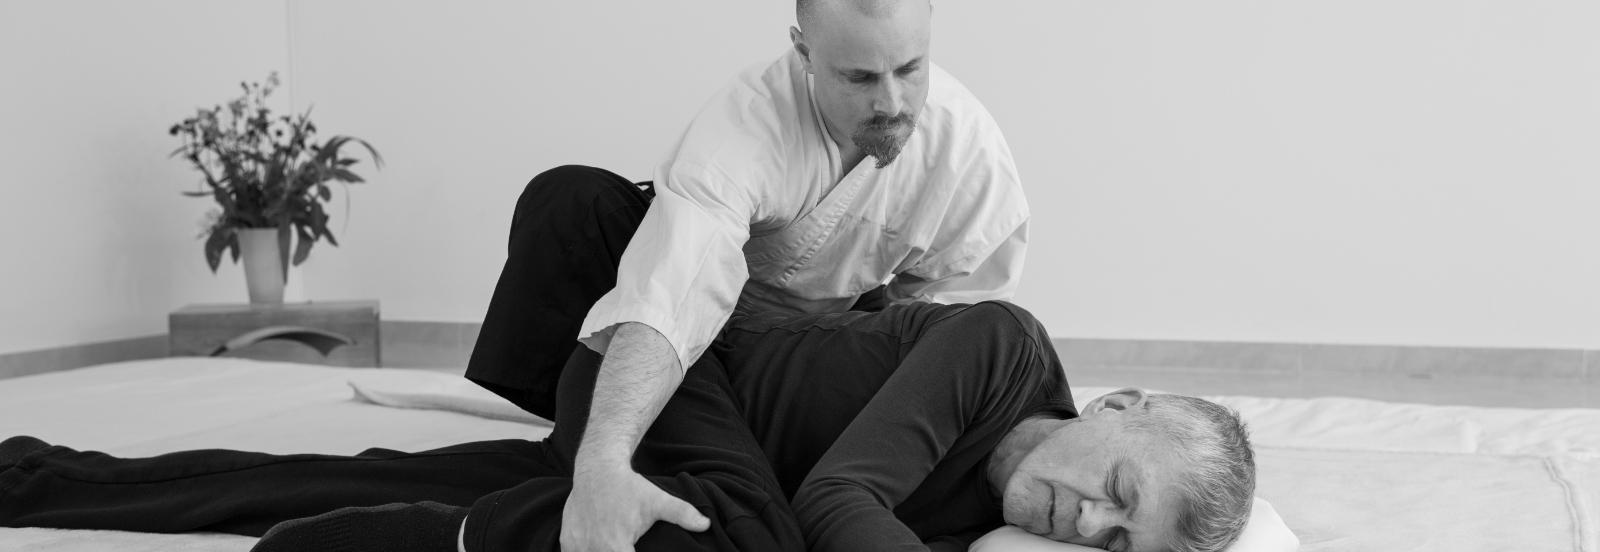 Exemple pratique : Shiatsu et migraine